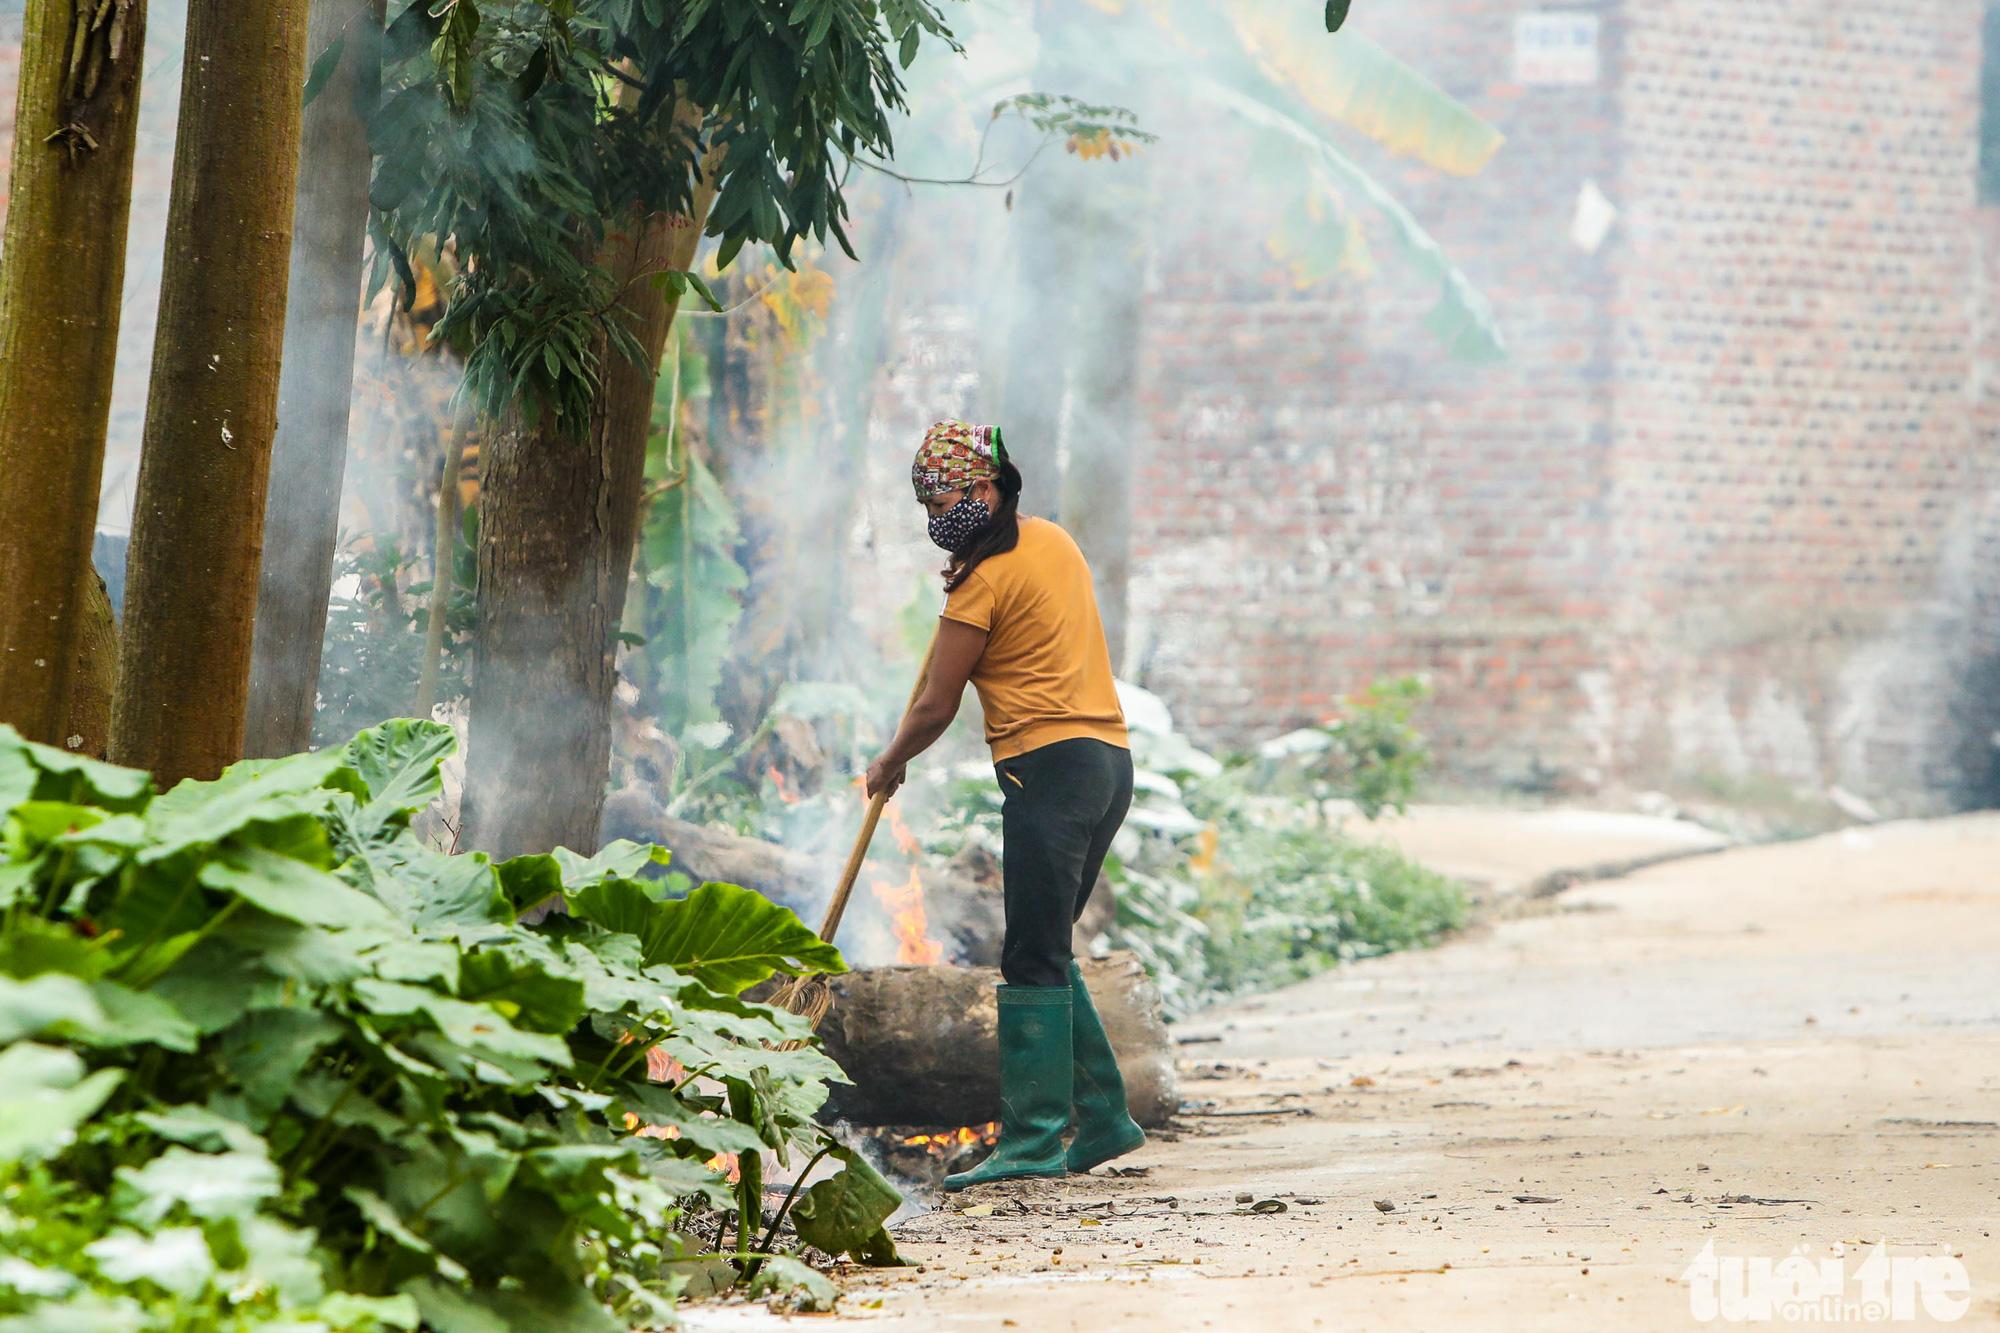 A resident burns rubbish in Ai Van village in Son Loi Commune, Binh Xuyen District, Vinh Phuc Province, Vietnam in this photo taken on February 11, 2020. Photo: Nguyen Khanh / Tuoi Tre